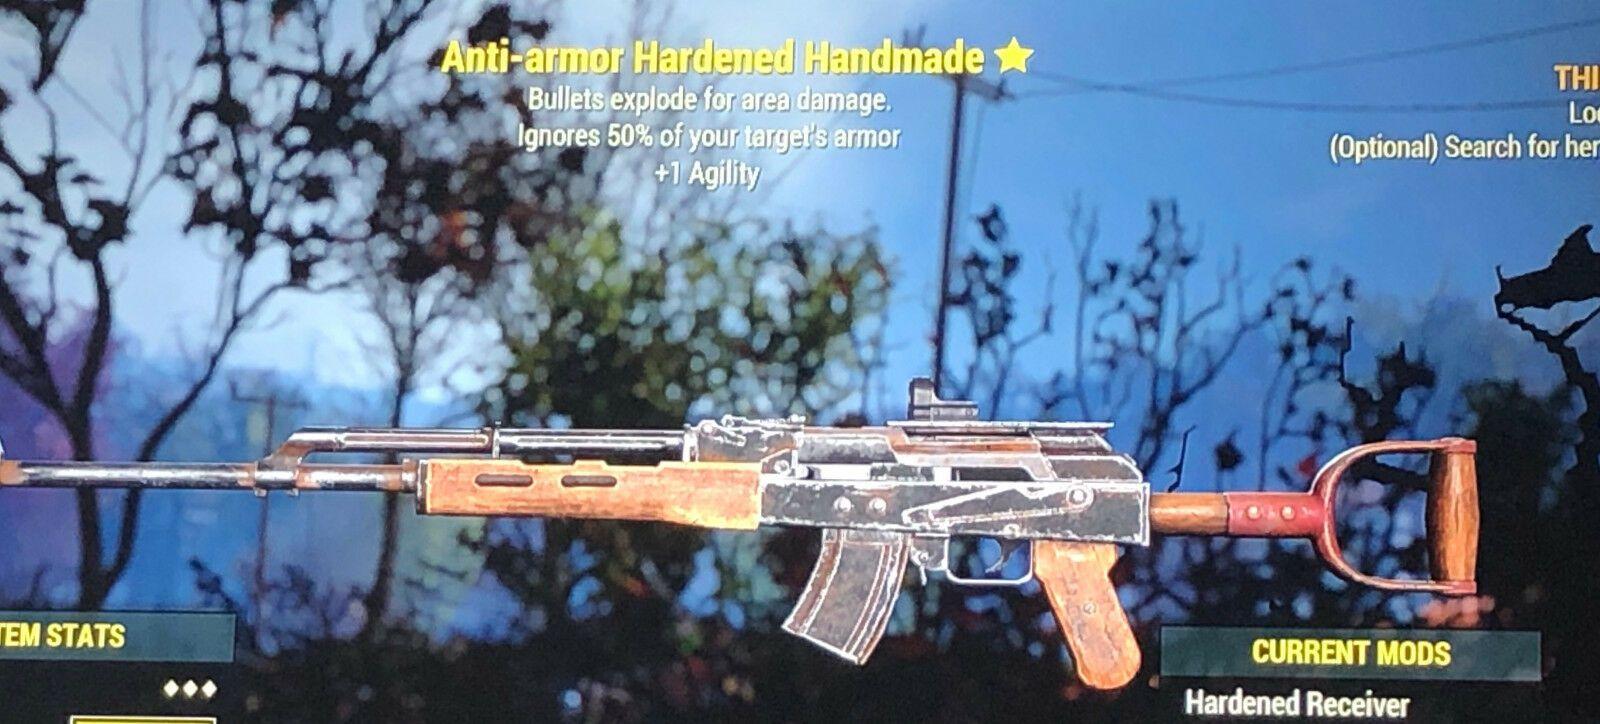 Video Game Merchandise 38583: Anti-Armor Explosive Handmade Rare New